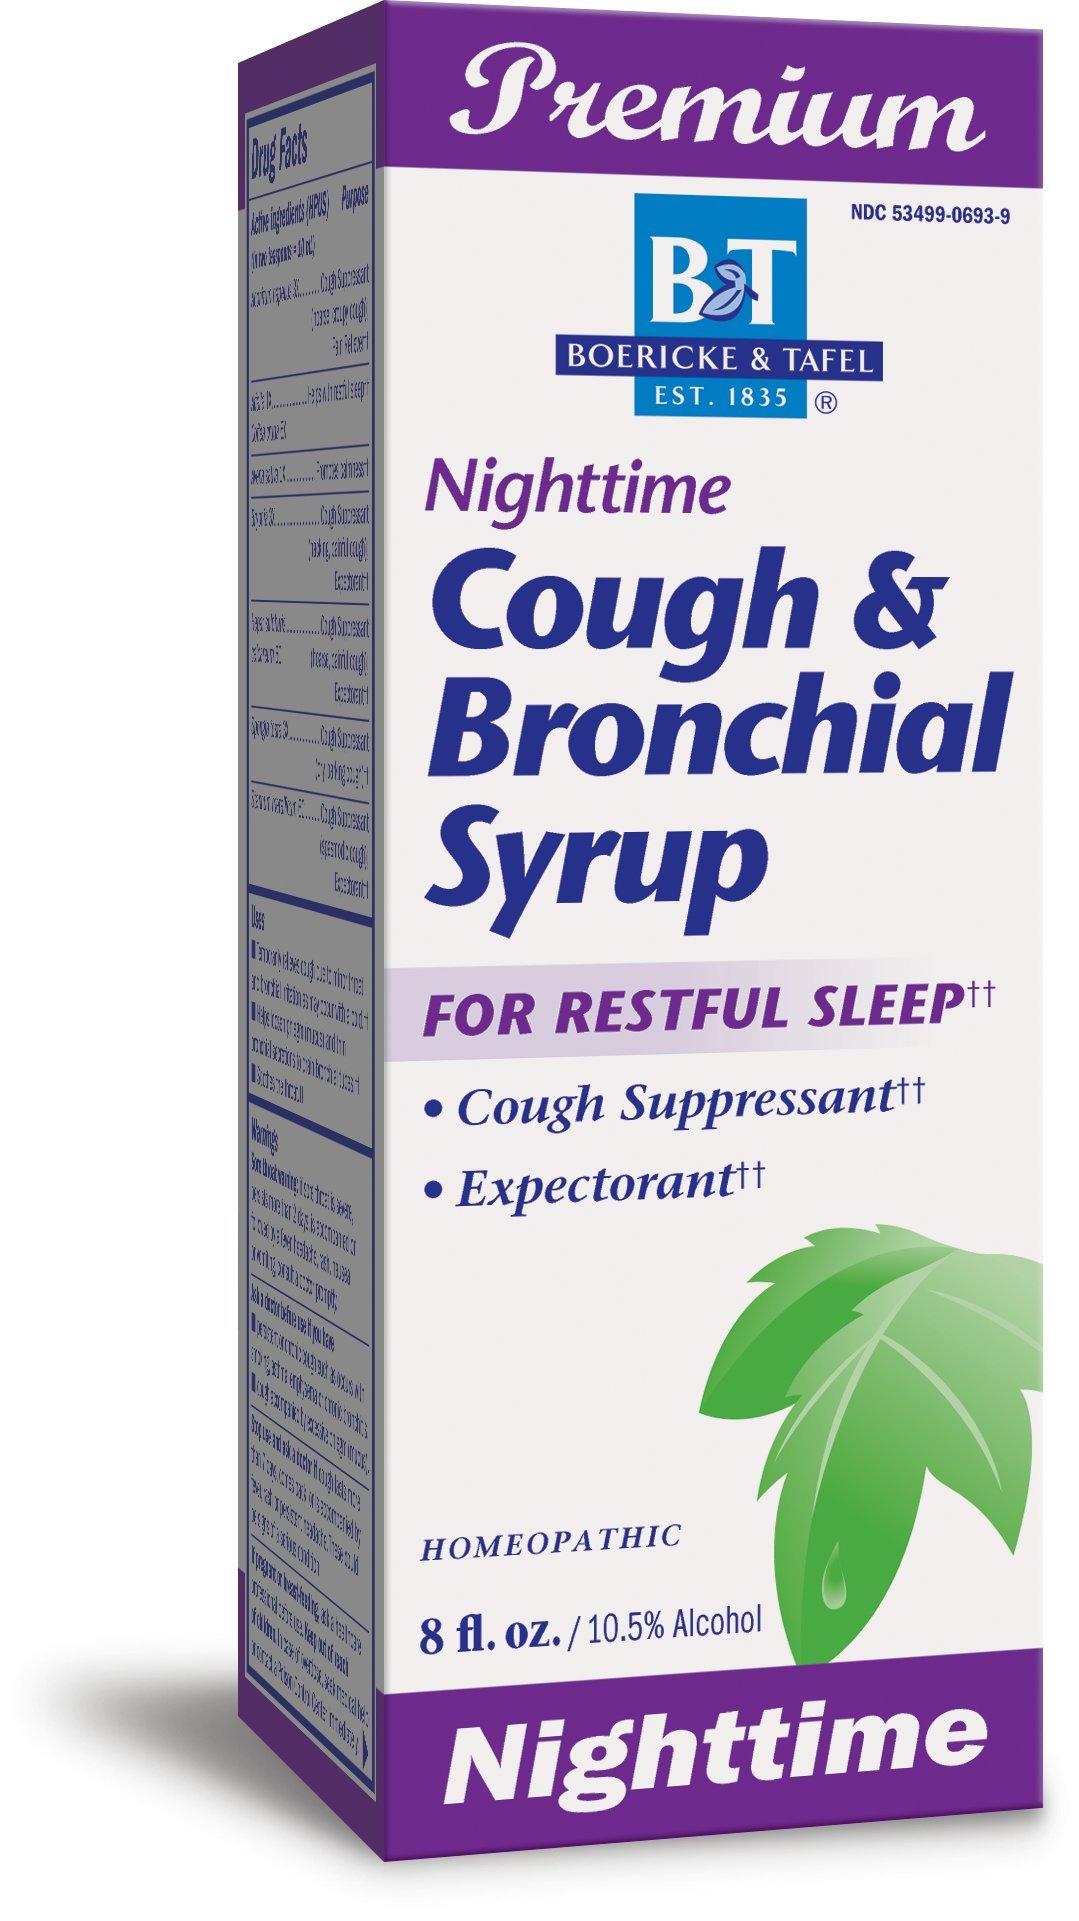 Boericke & Tafel Nighttime Cough & Bronchial Syrup, 8 Ounce